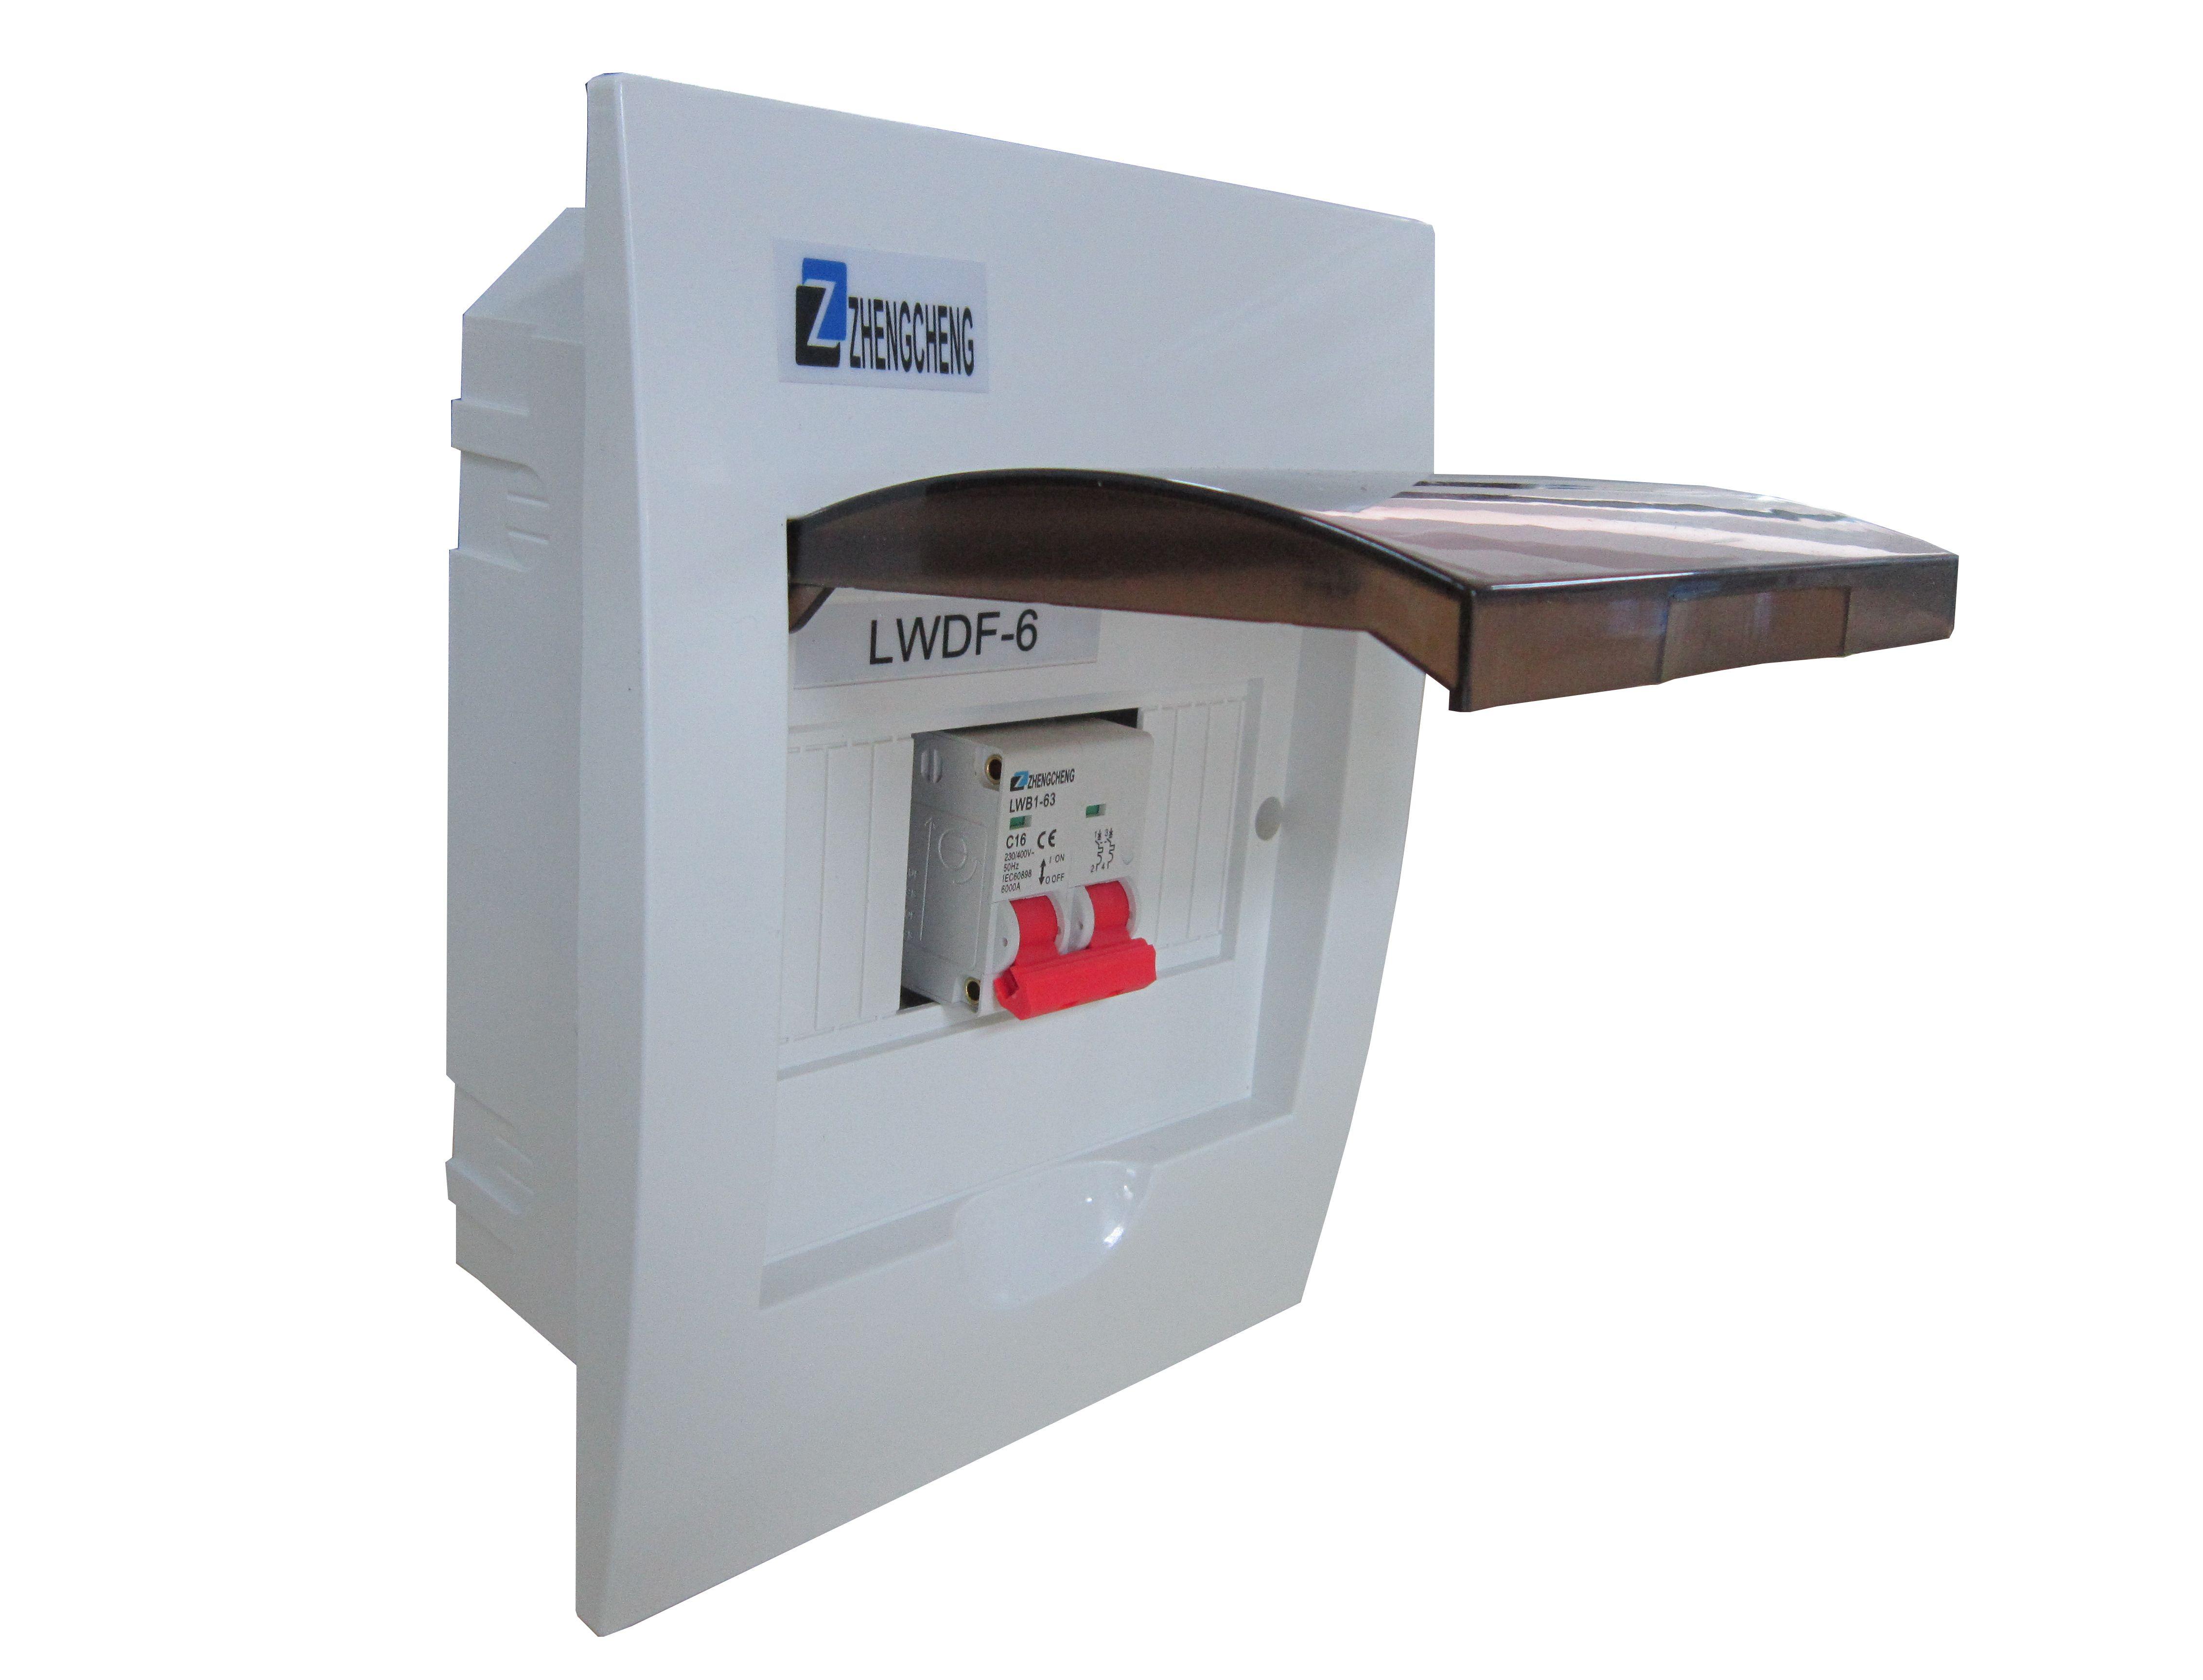 6 Way Flush Mount Distribution Box Mcb Miniature Circuit Breaker Faz Breakers Miniatures Snare Drum